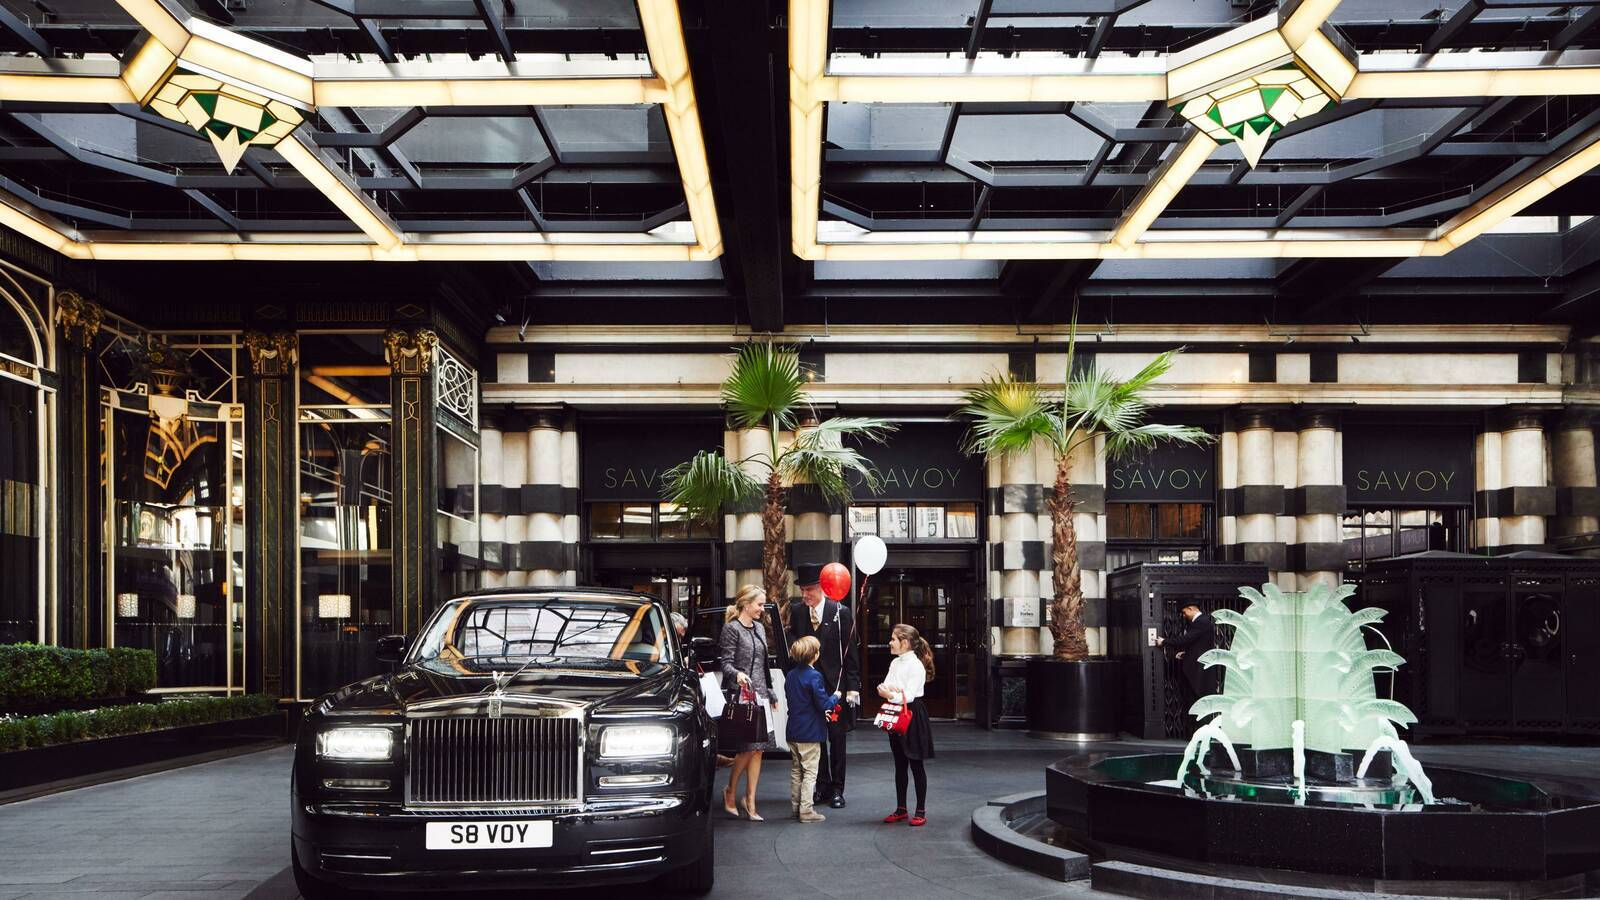 Fairmont Savoy Londres